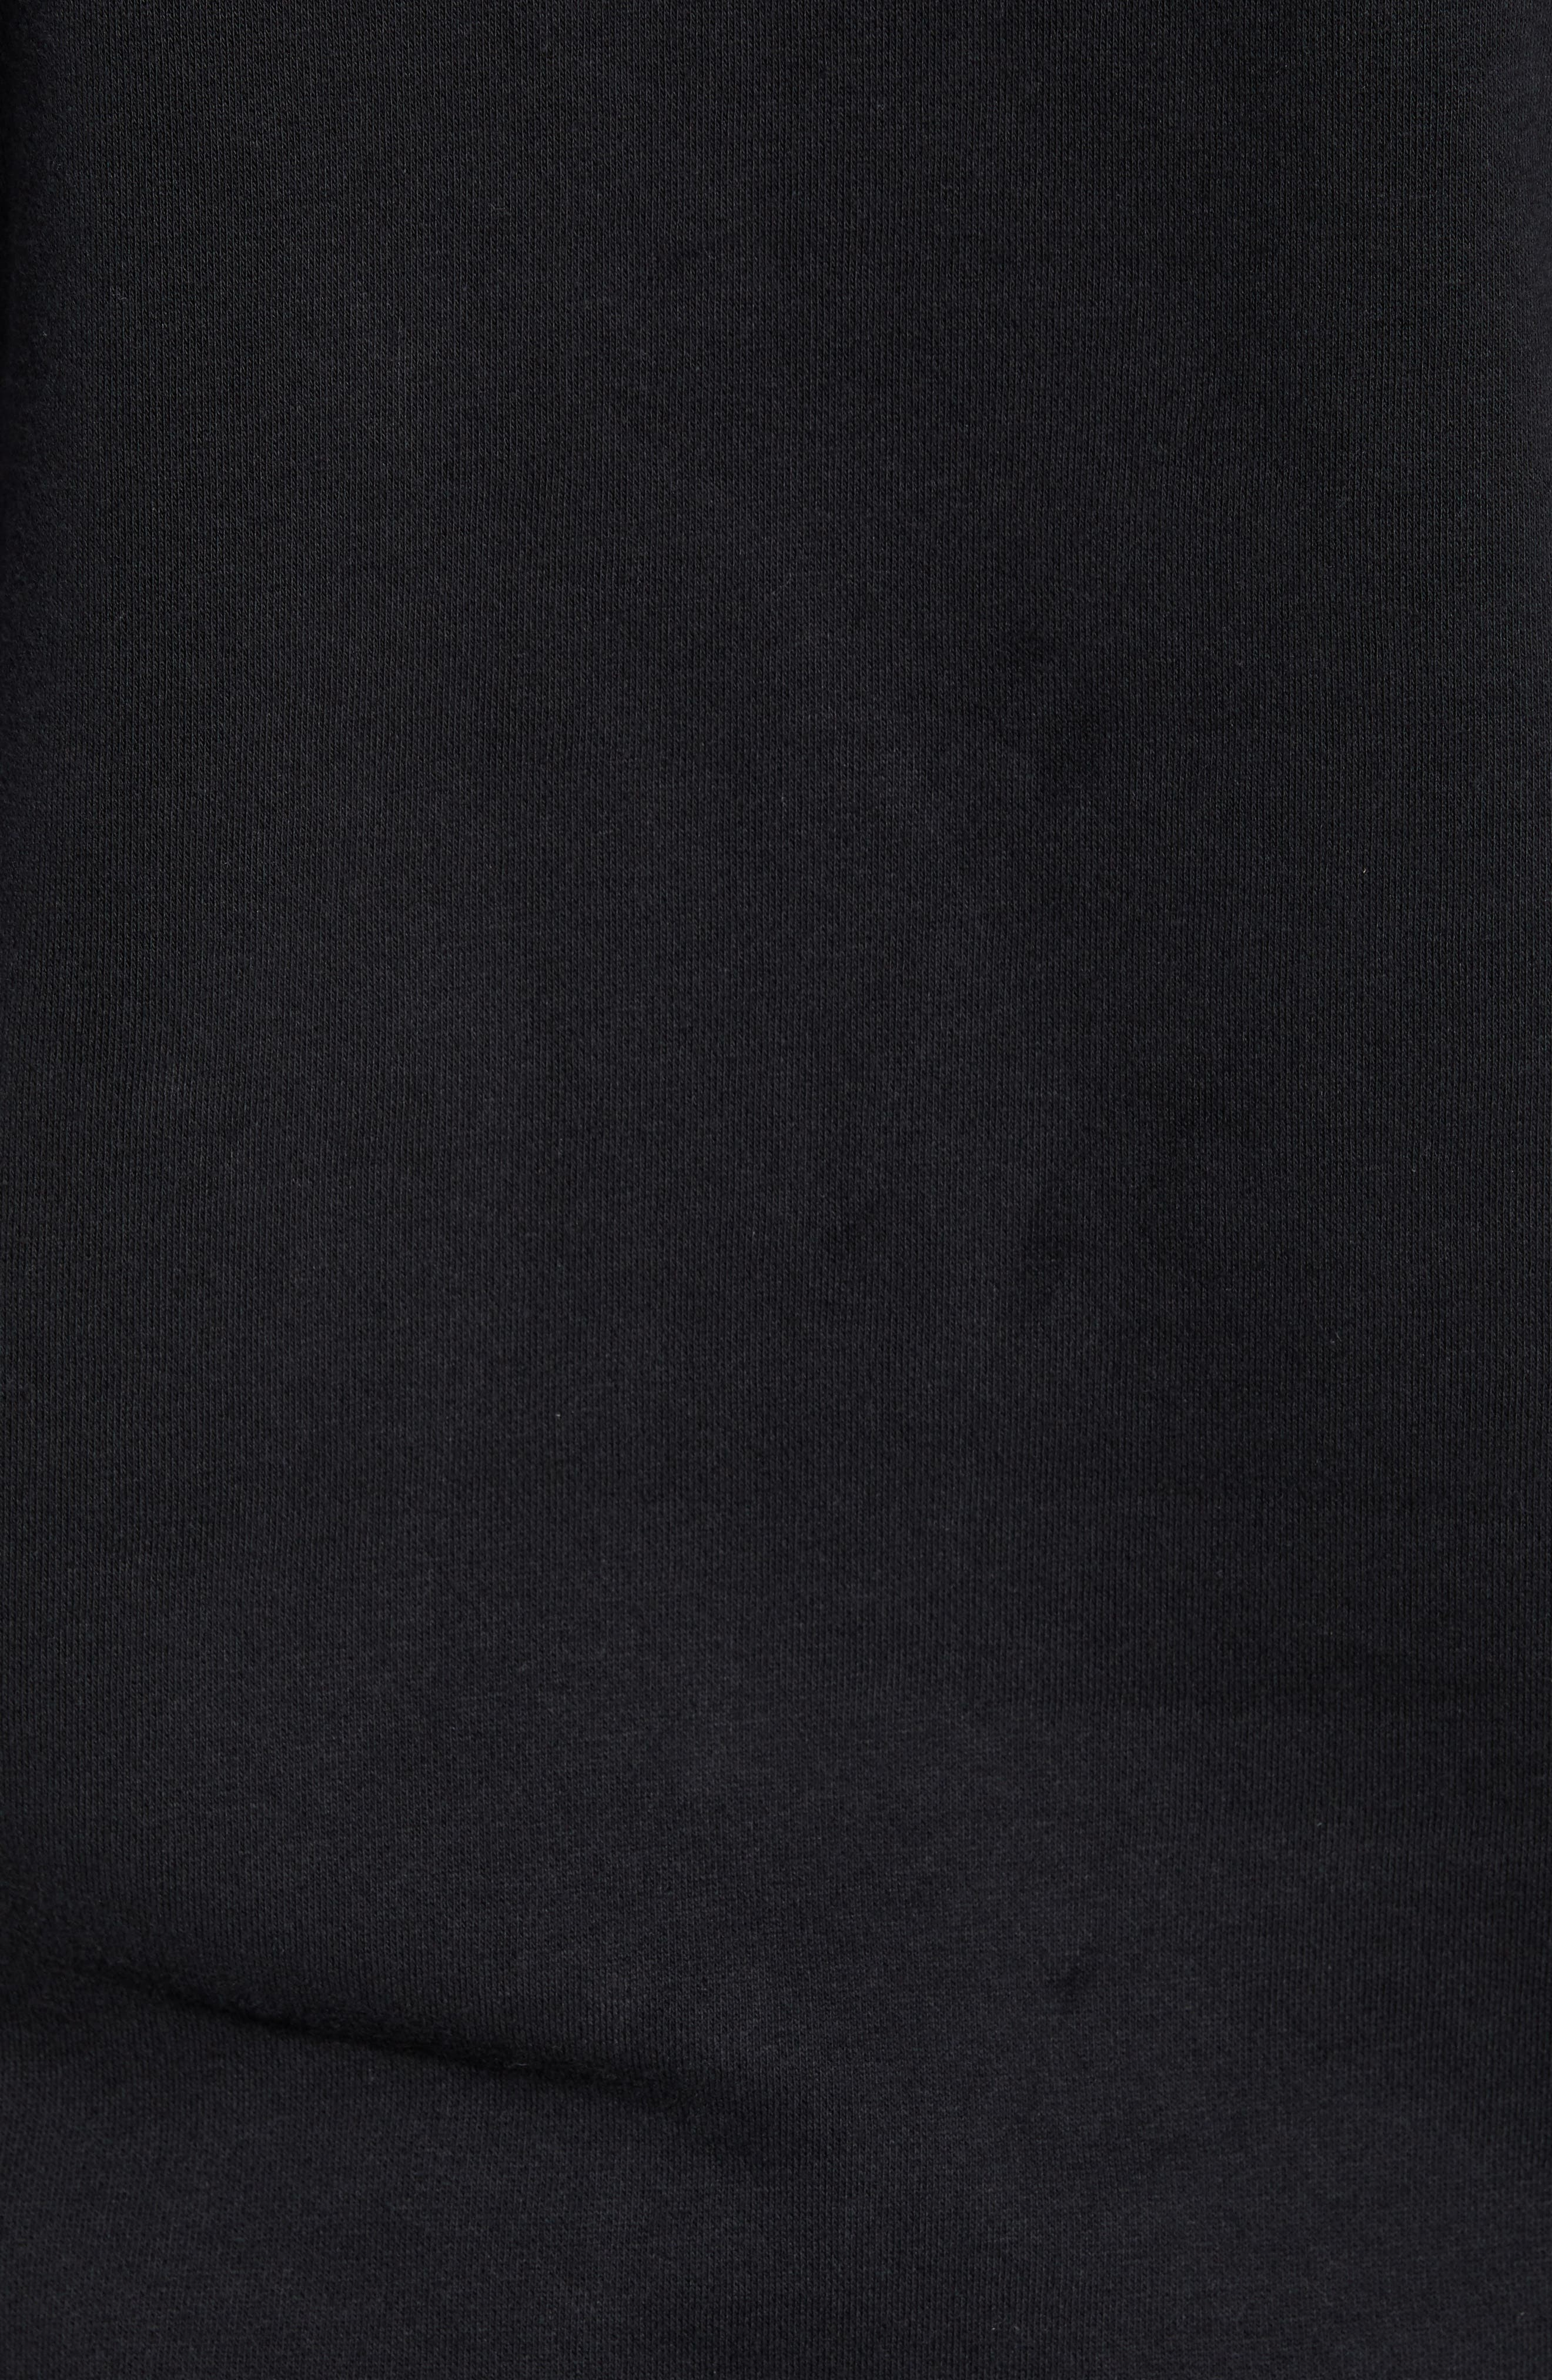 JORDAN, JSW Greatest Stats Graphic Sweatshirt, Alternate thumbnail 6, color, BLACK